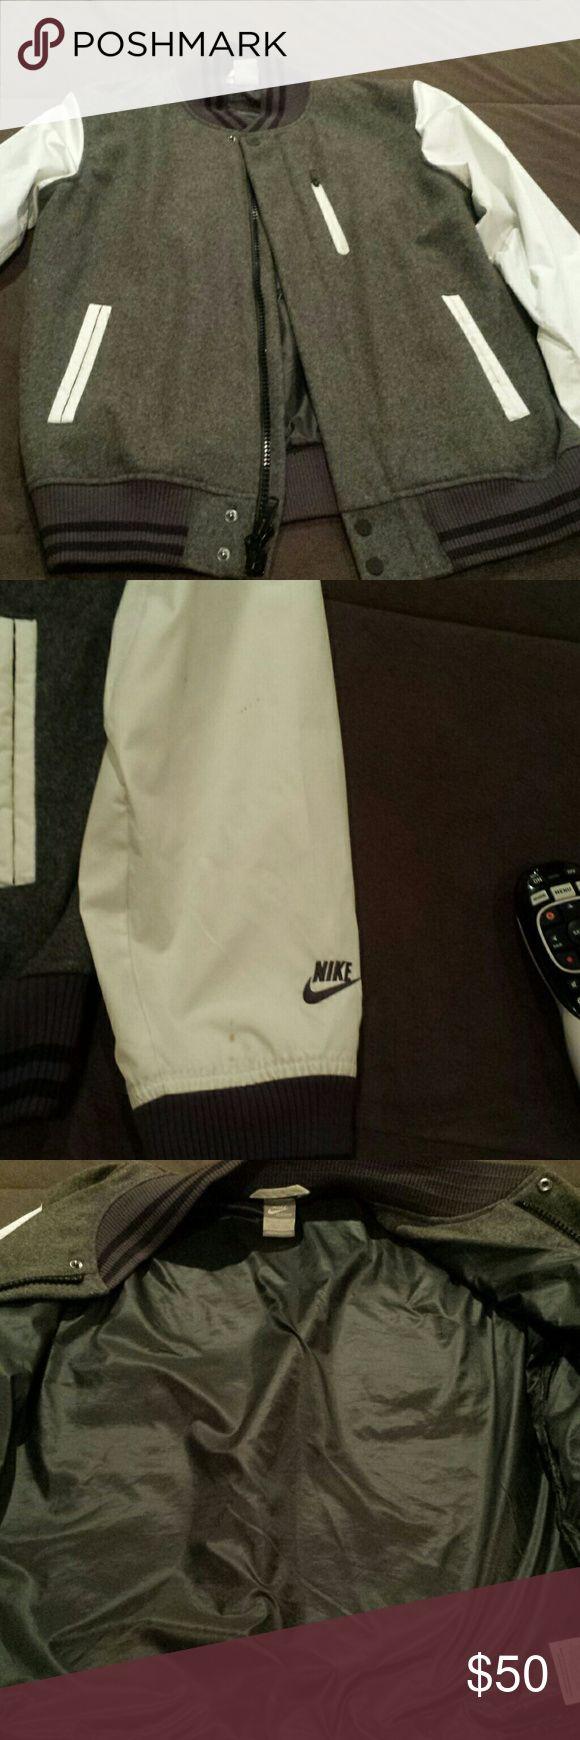 Men's Nike Varsity Jacket Men's Nike Varsity Jacket in Good Condition Nike Jackets & Coats Bomber & Varsity